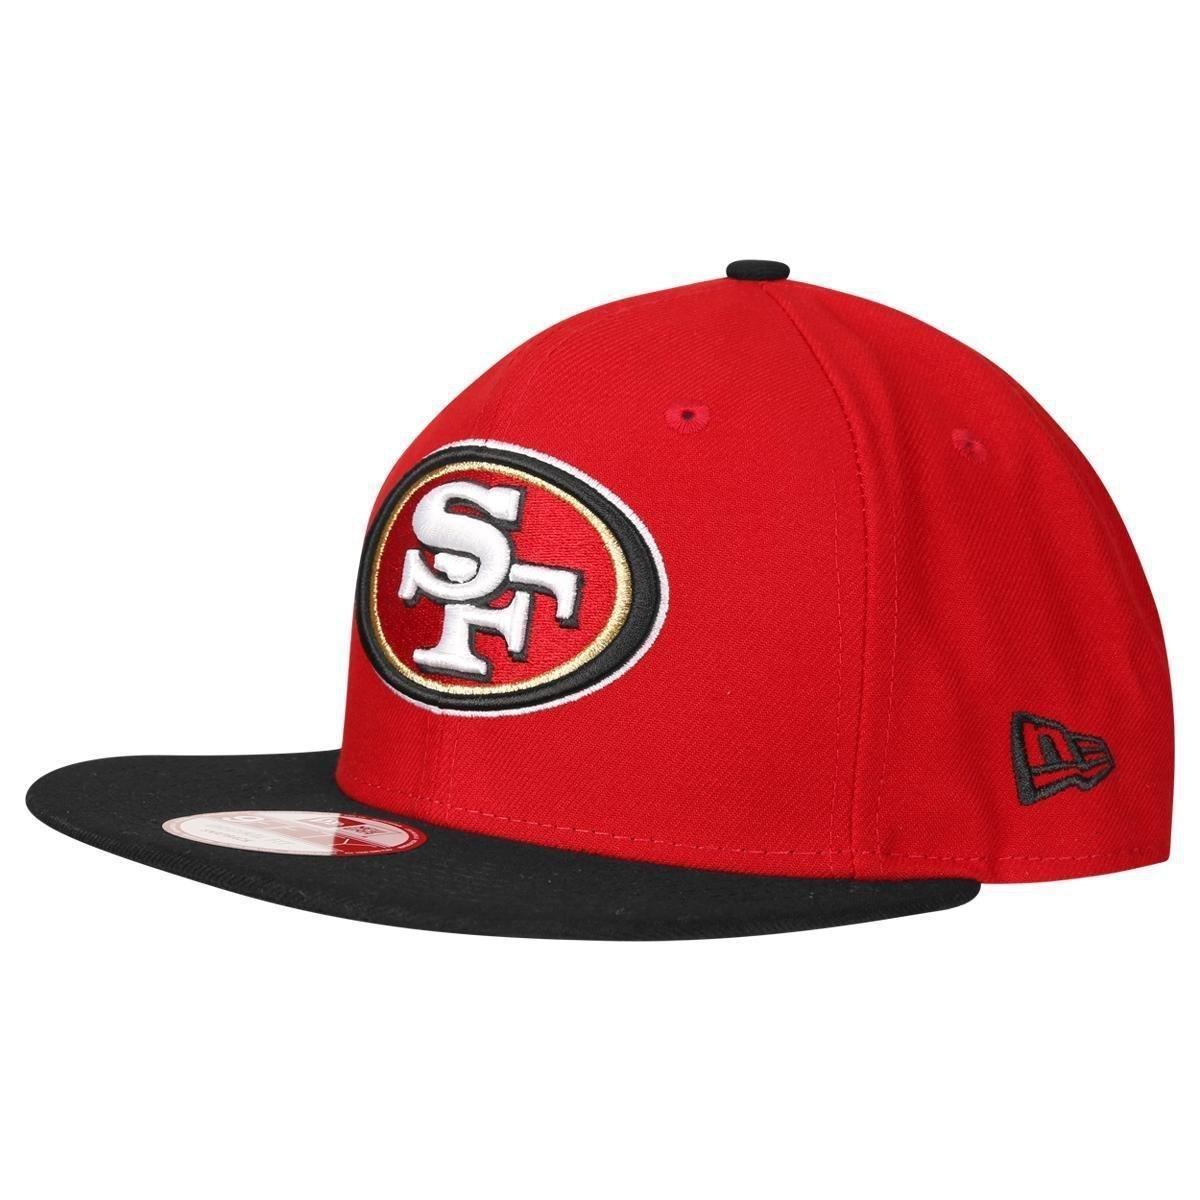 5e6106d278 Boné New Era 950 NFL Of Sn Classic Team San Francisco 49Ers - ...